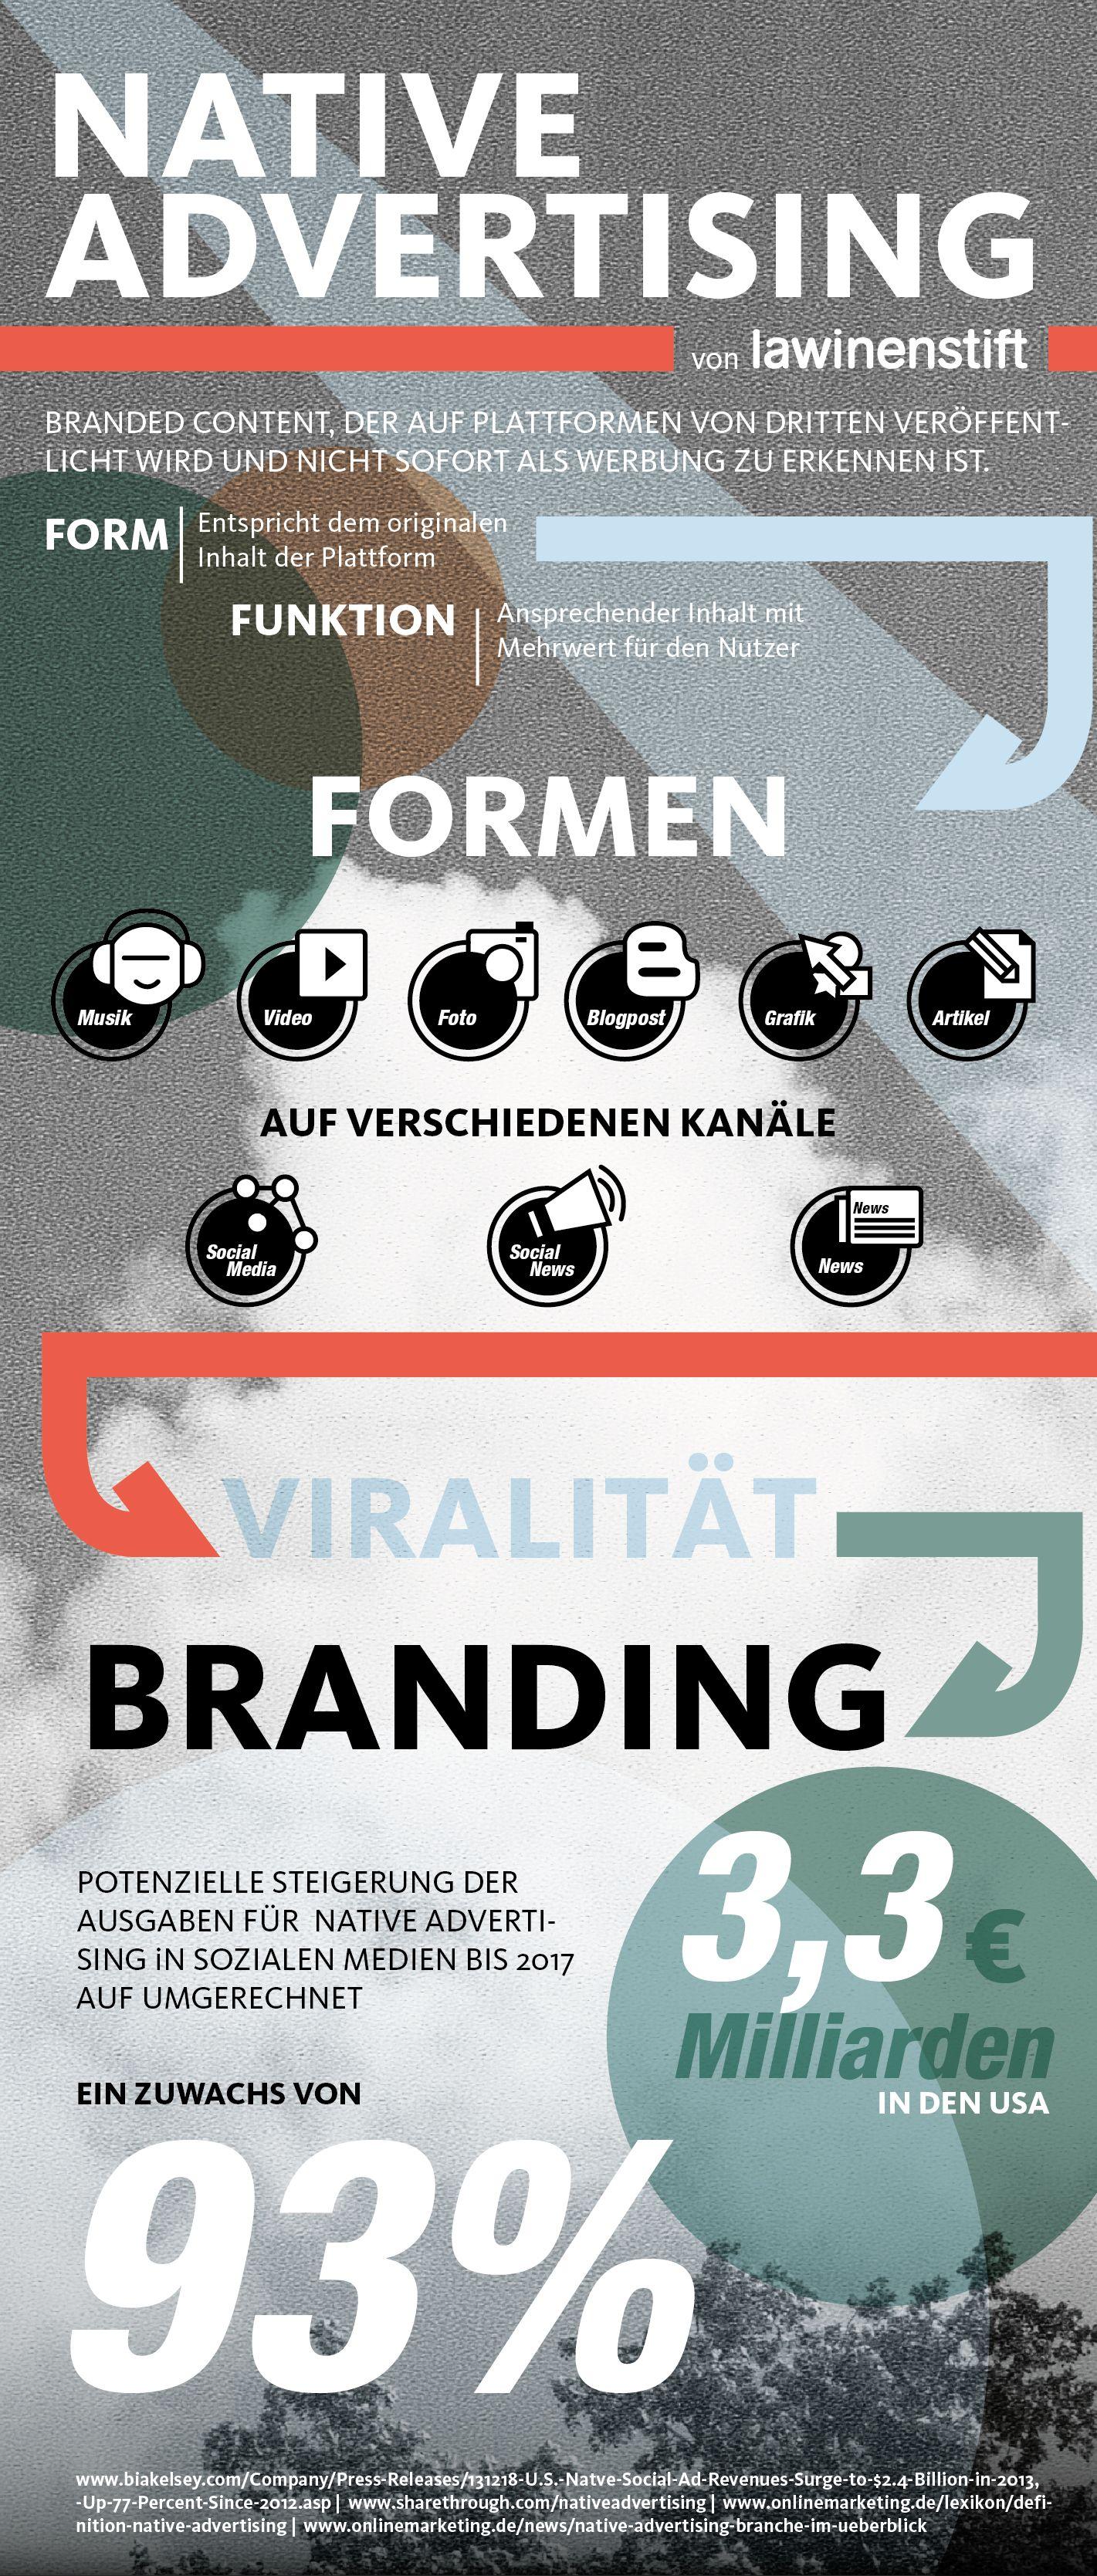 Native Advertising Infografik Native advertising